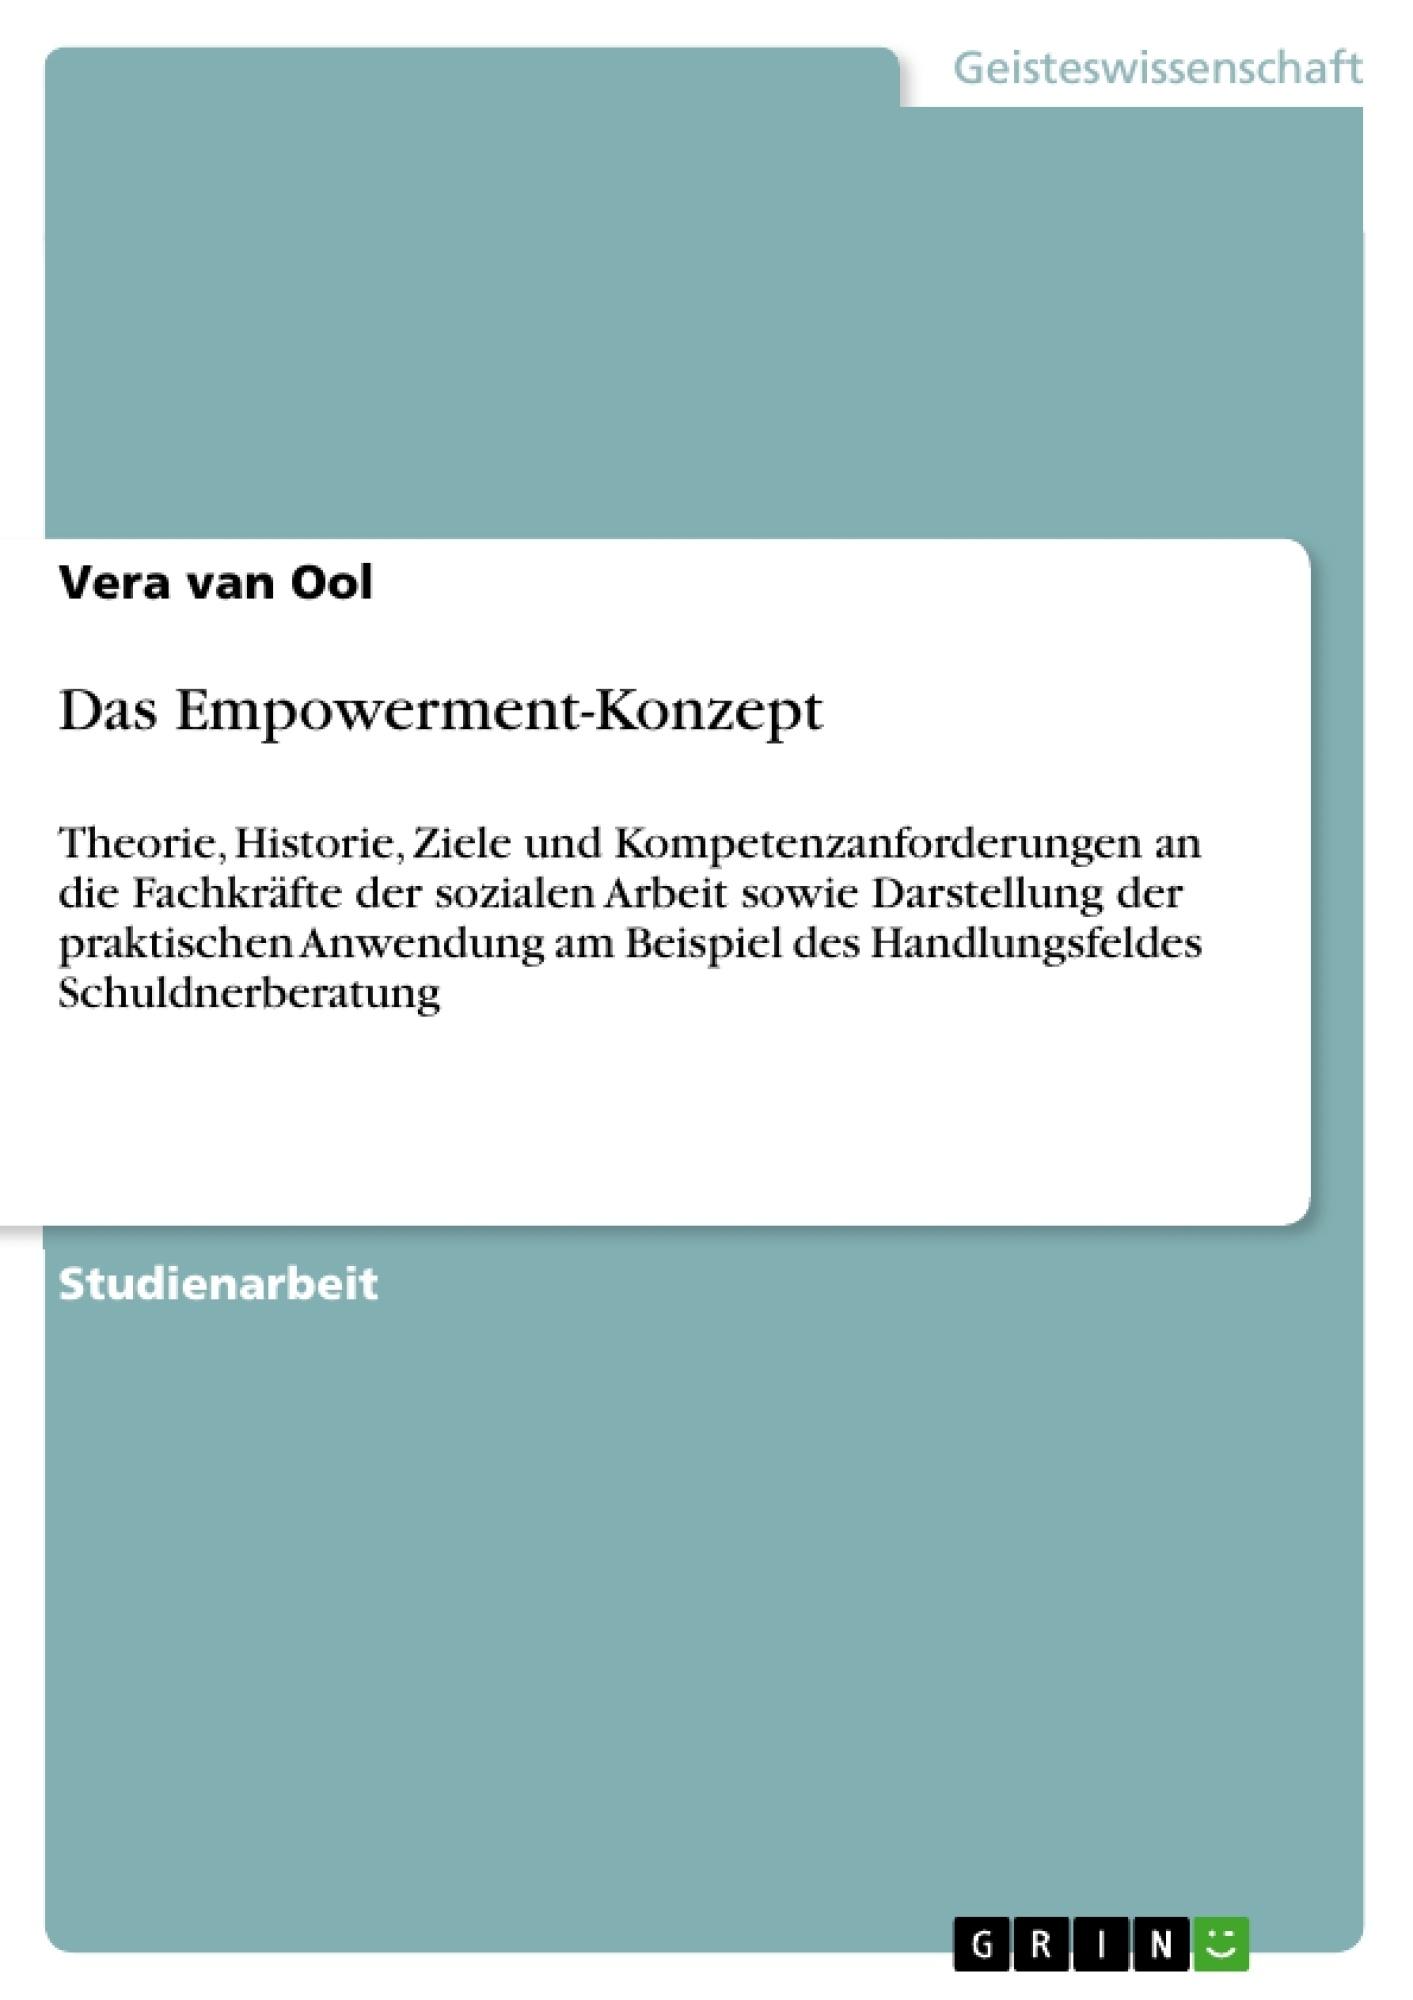 Titel: Das Empowerment-Konzept